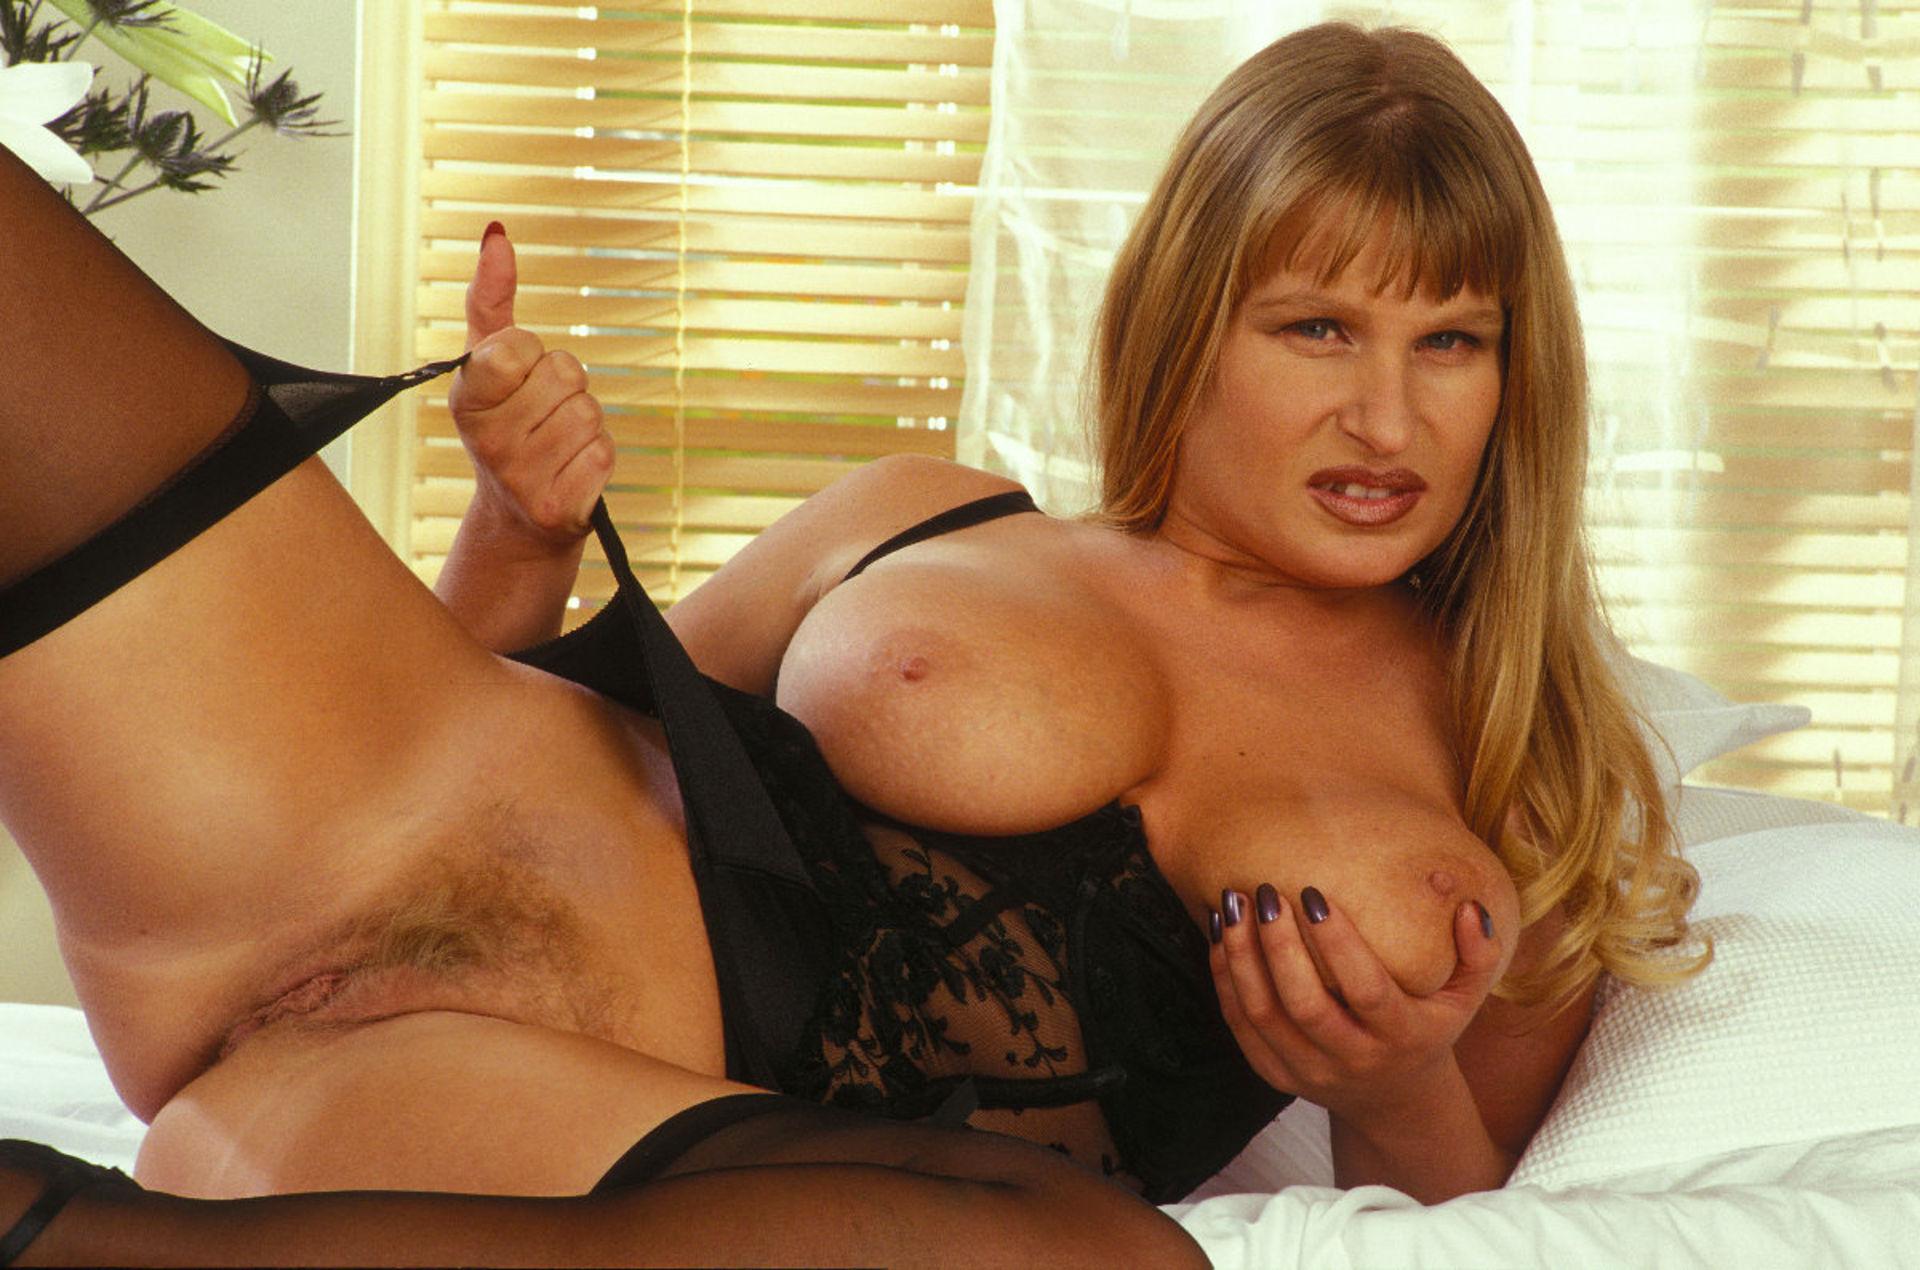 Саманта фокс порноролик, Саманта фокс. Лучшие секс видео. Онлайн порно 5 фотография